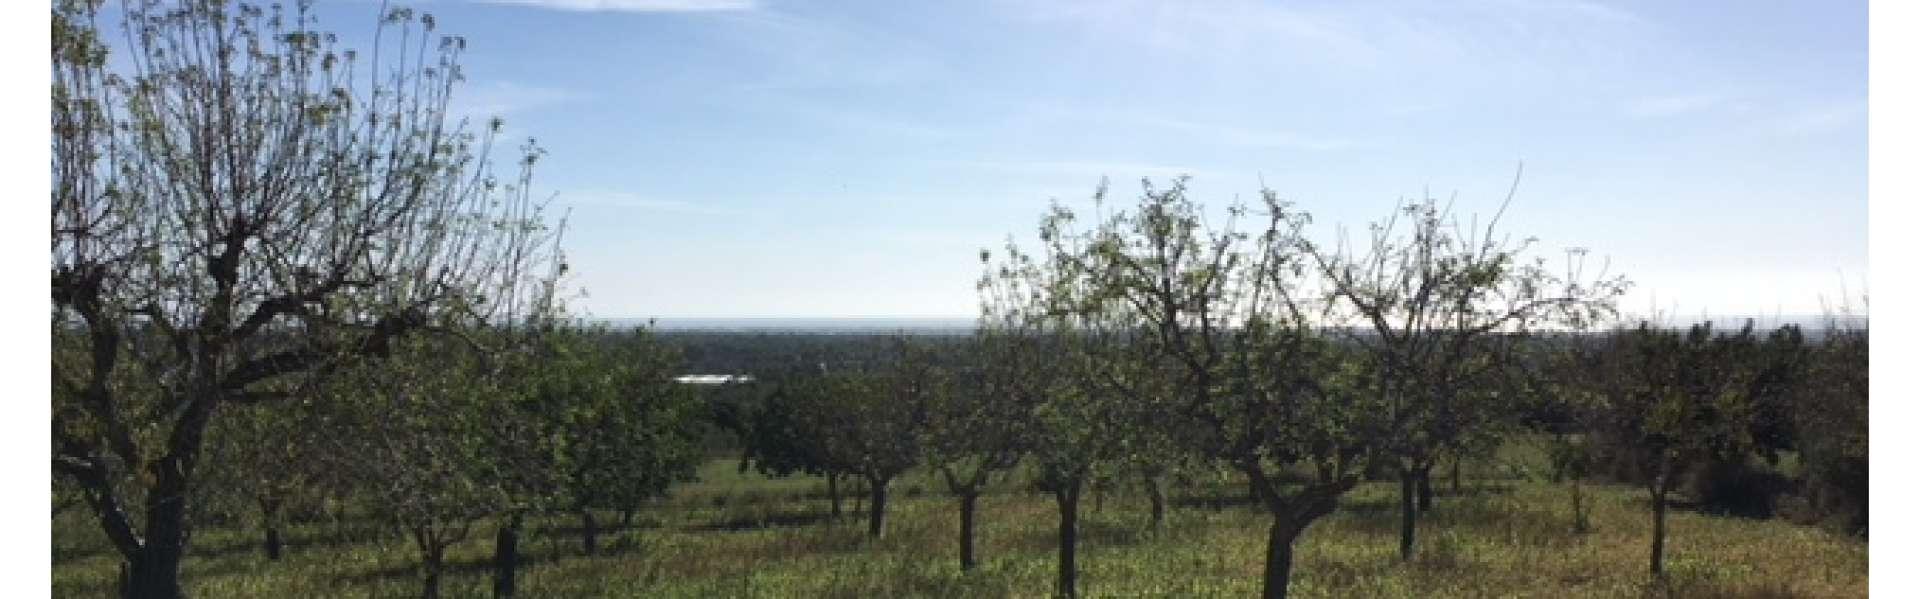 Alqueria Blanca - Baugrundstück mit Traumblick